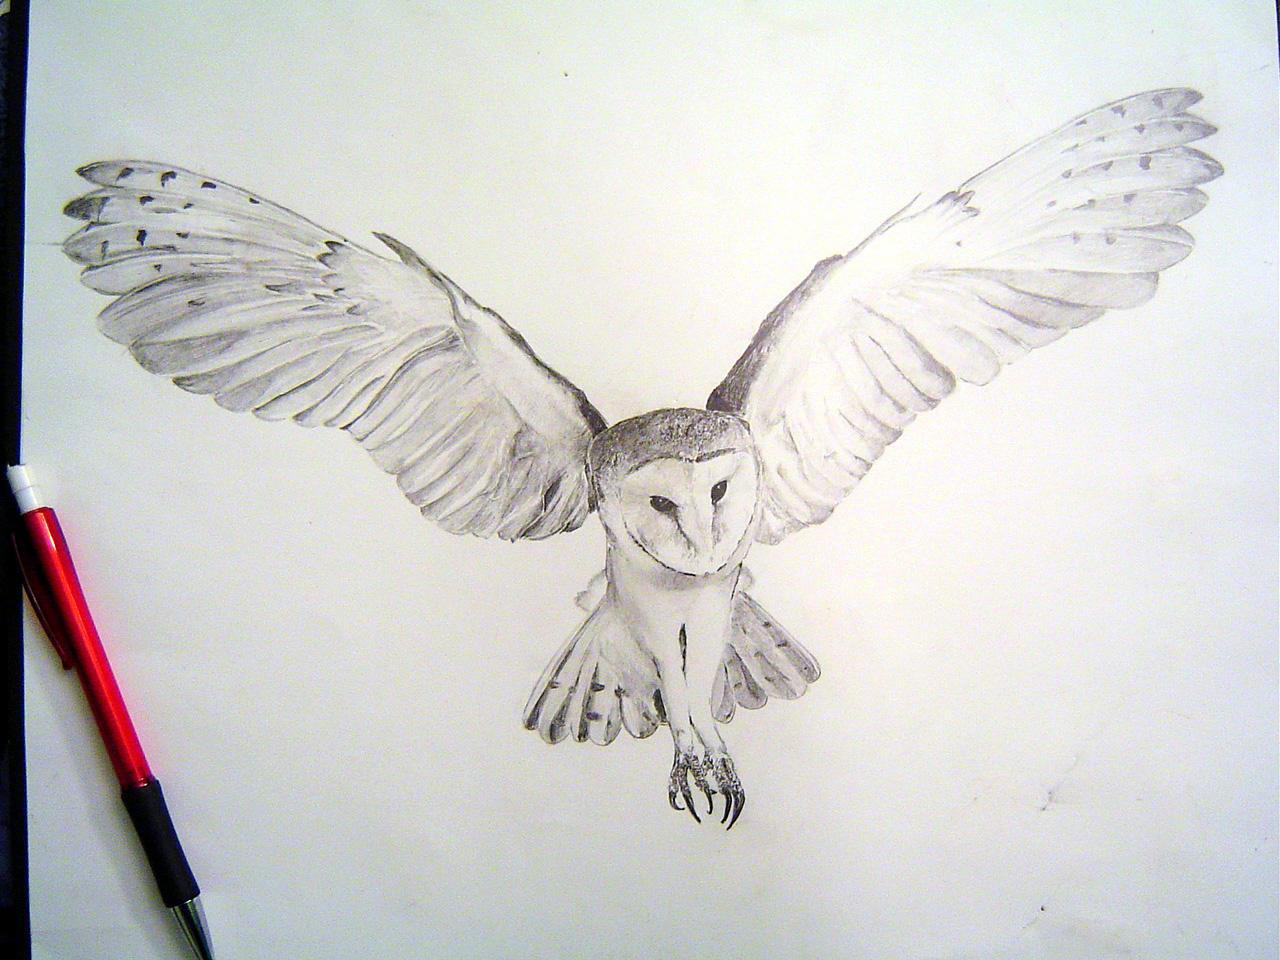 Barn Owl Tight Render by Tophoid on DeviantArt